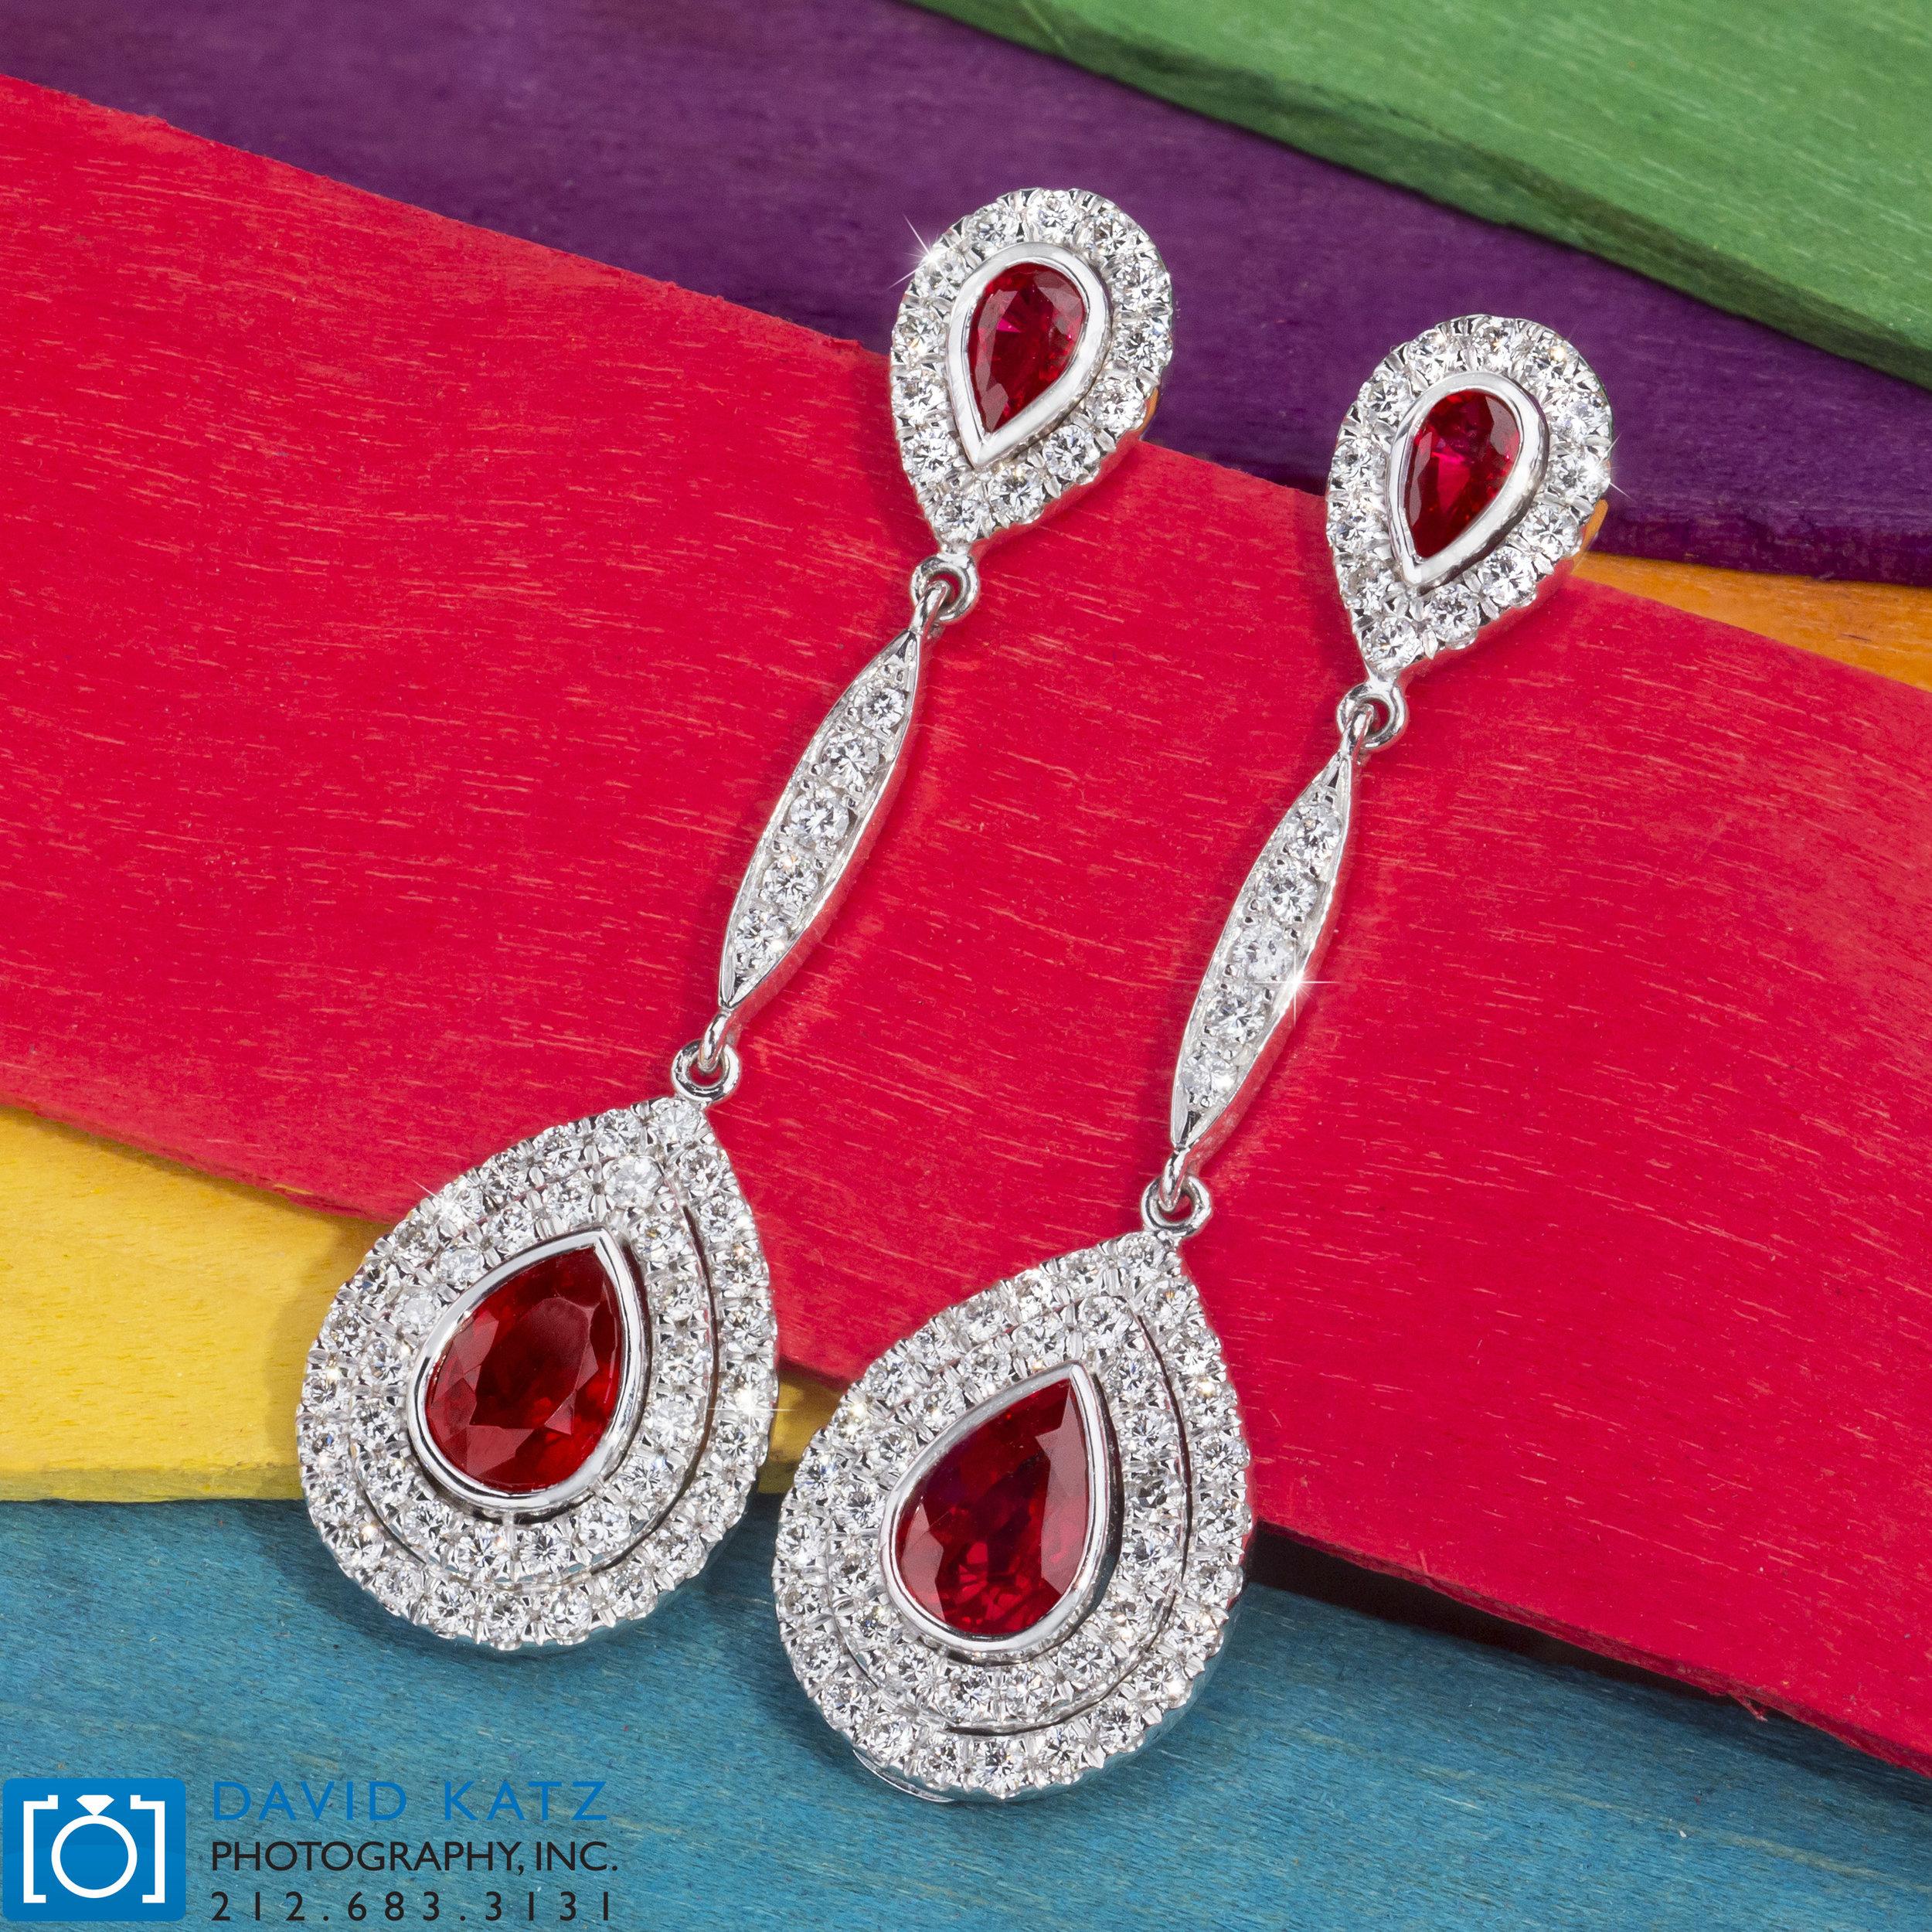 Ruby Earrings on Colors_NEWLOGO.jpg